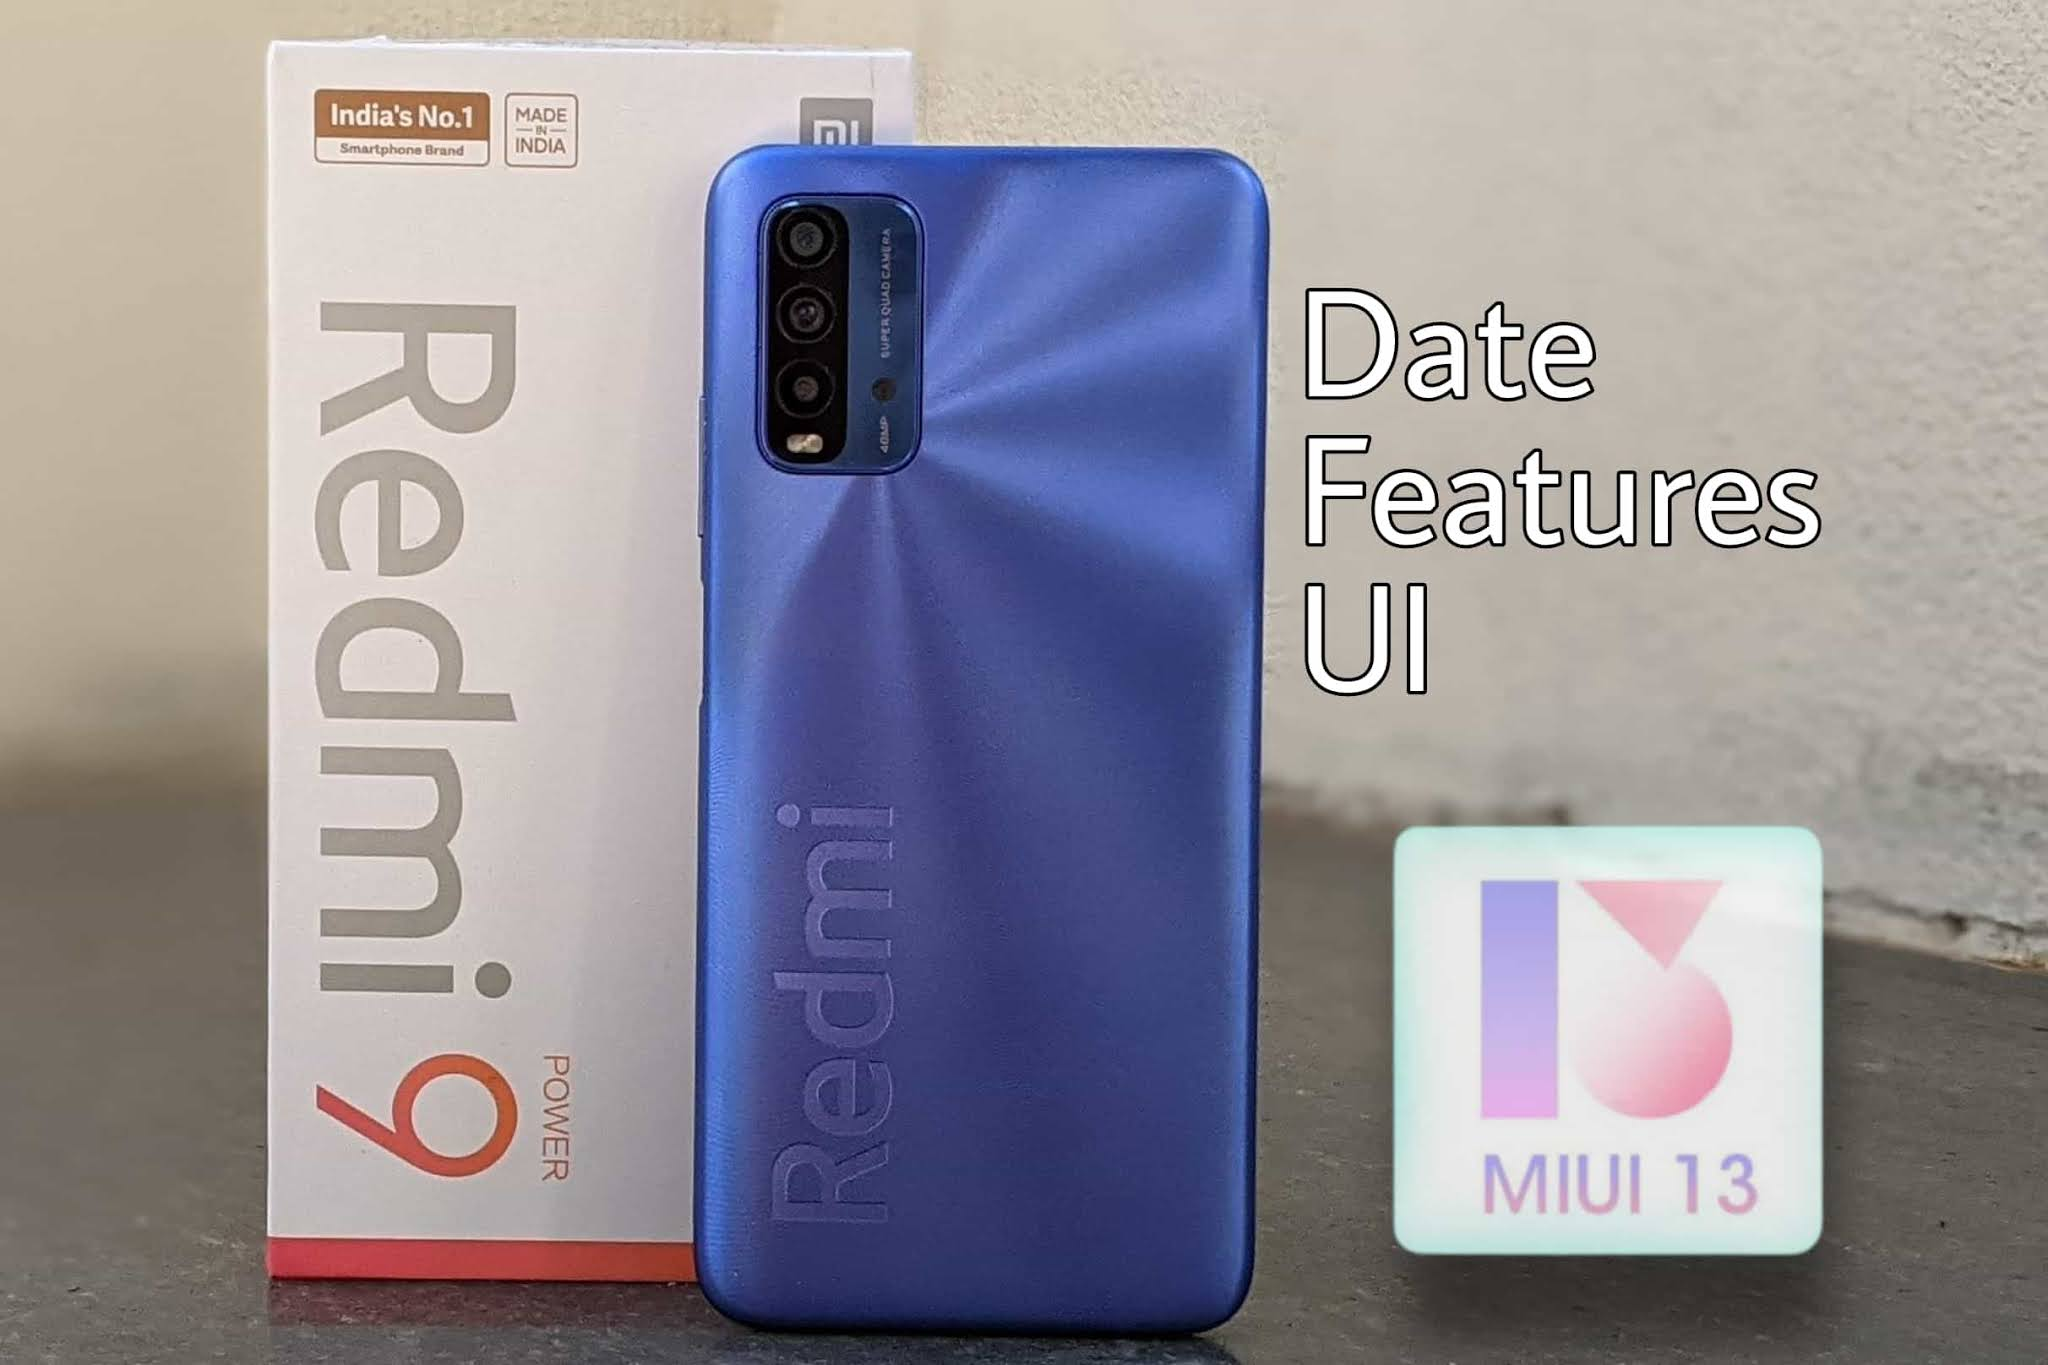 Redmi 9 Power MIUI 13